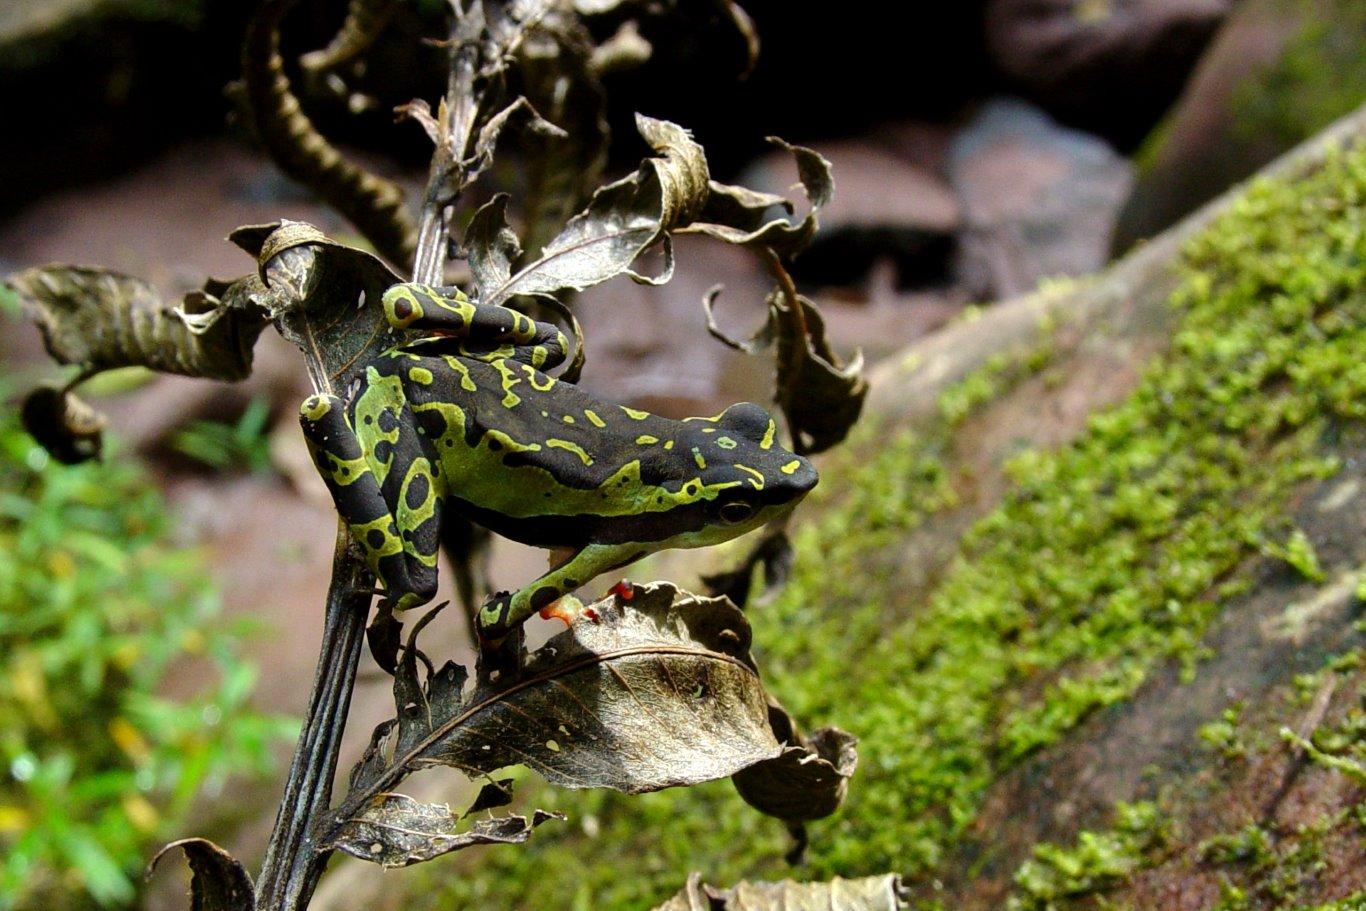 Atelopus pulcher, Harlequin Toad